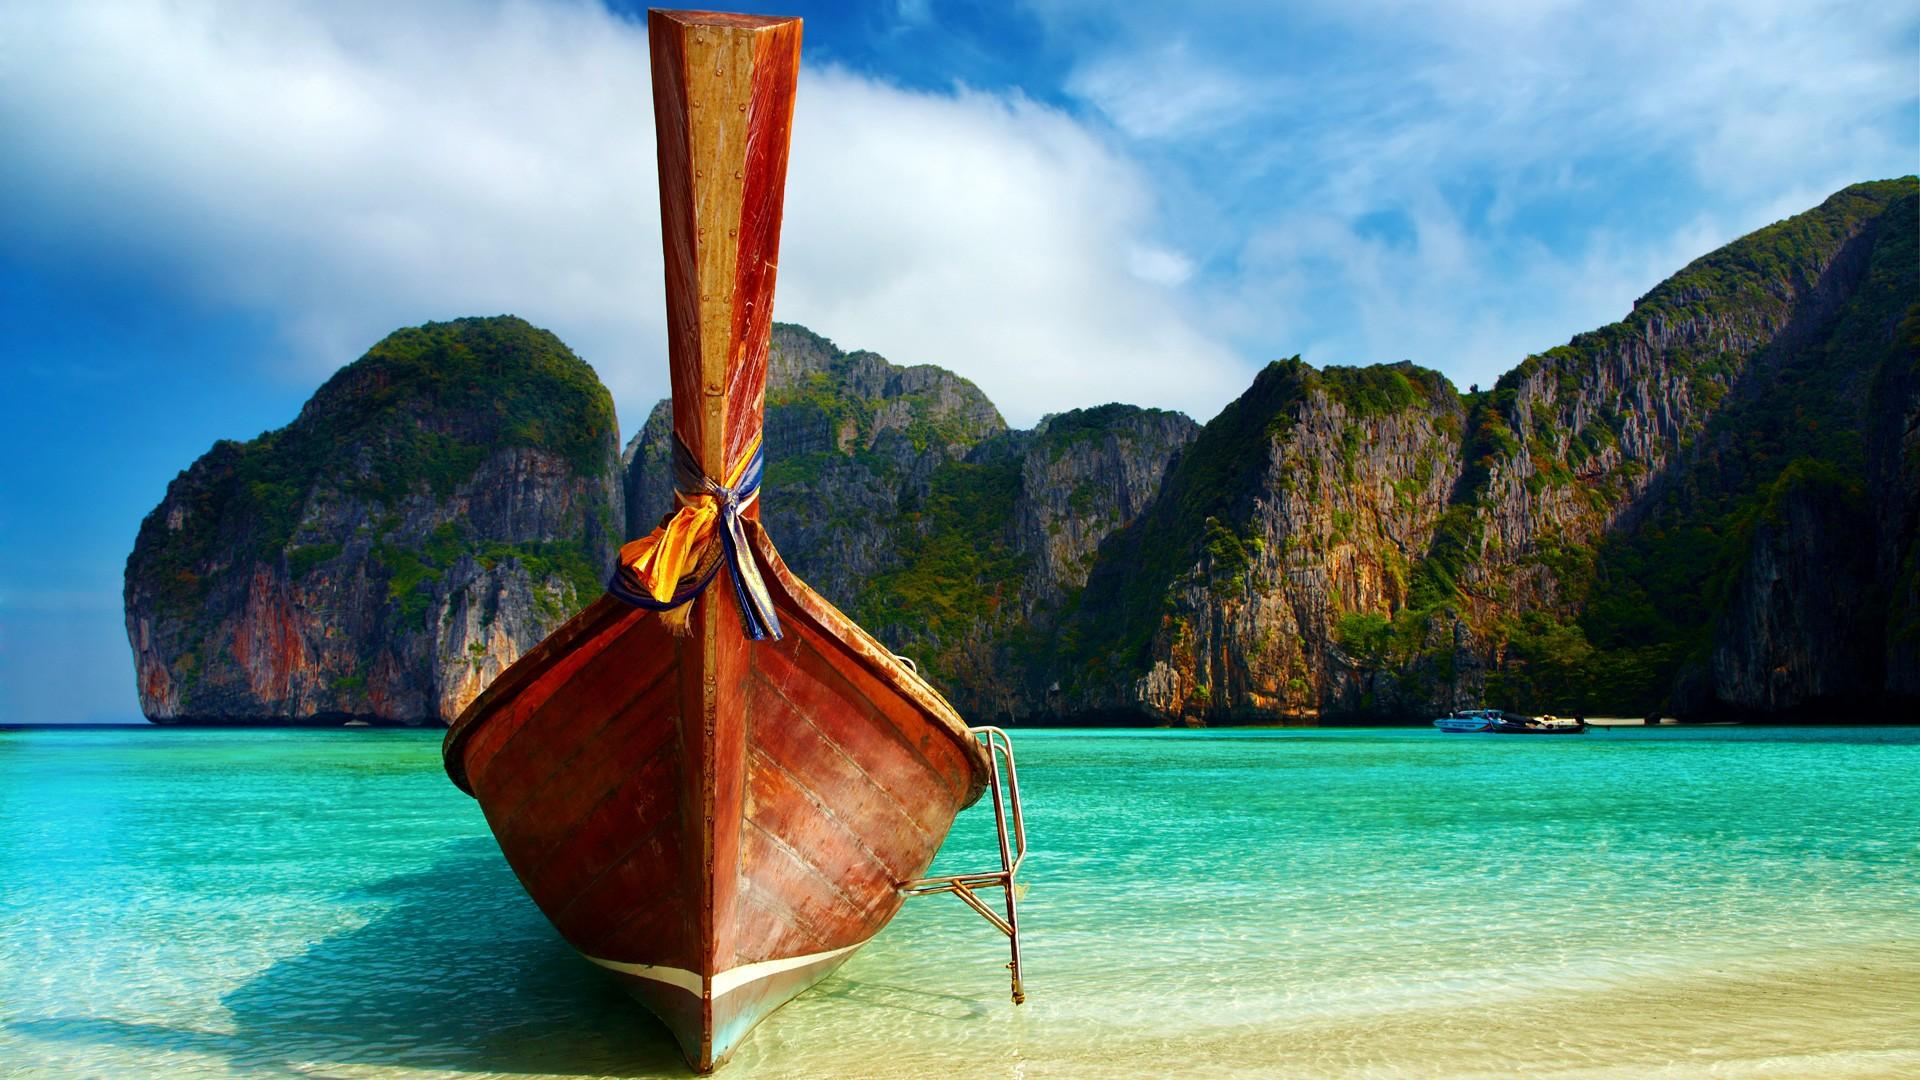 Wallpaper images tropical beach thailand beautiful for Wallpaper hd paesaggi